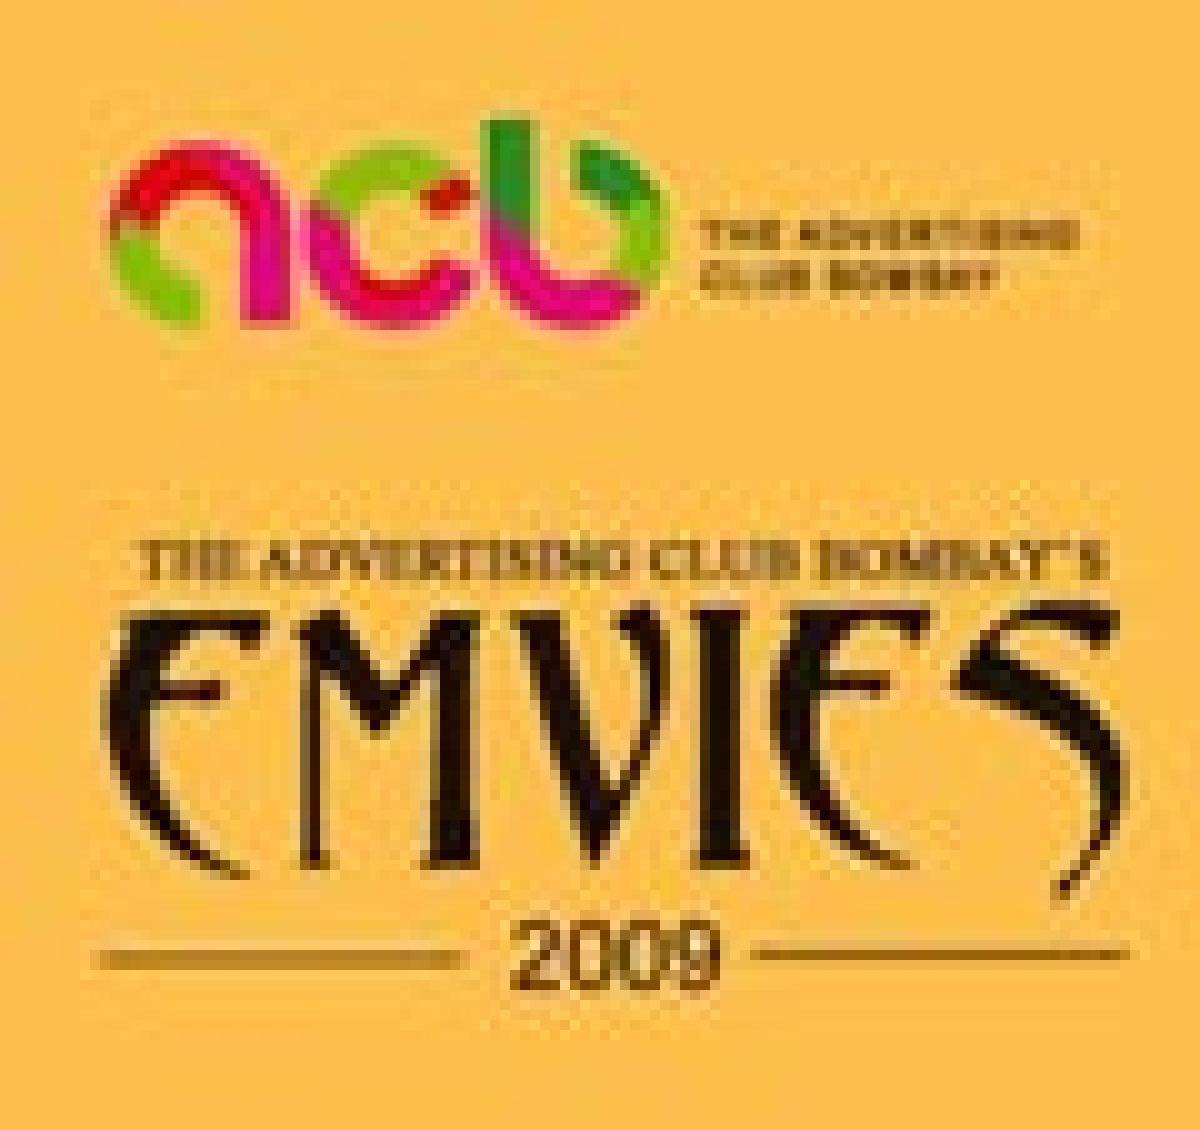 Mindshare has lion's share in Emvies'09 shortlist